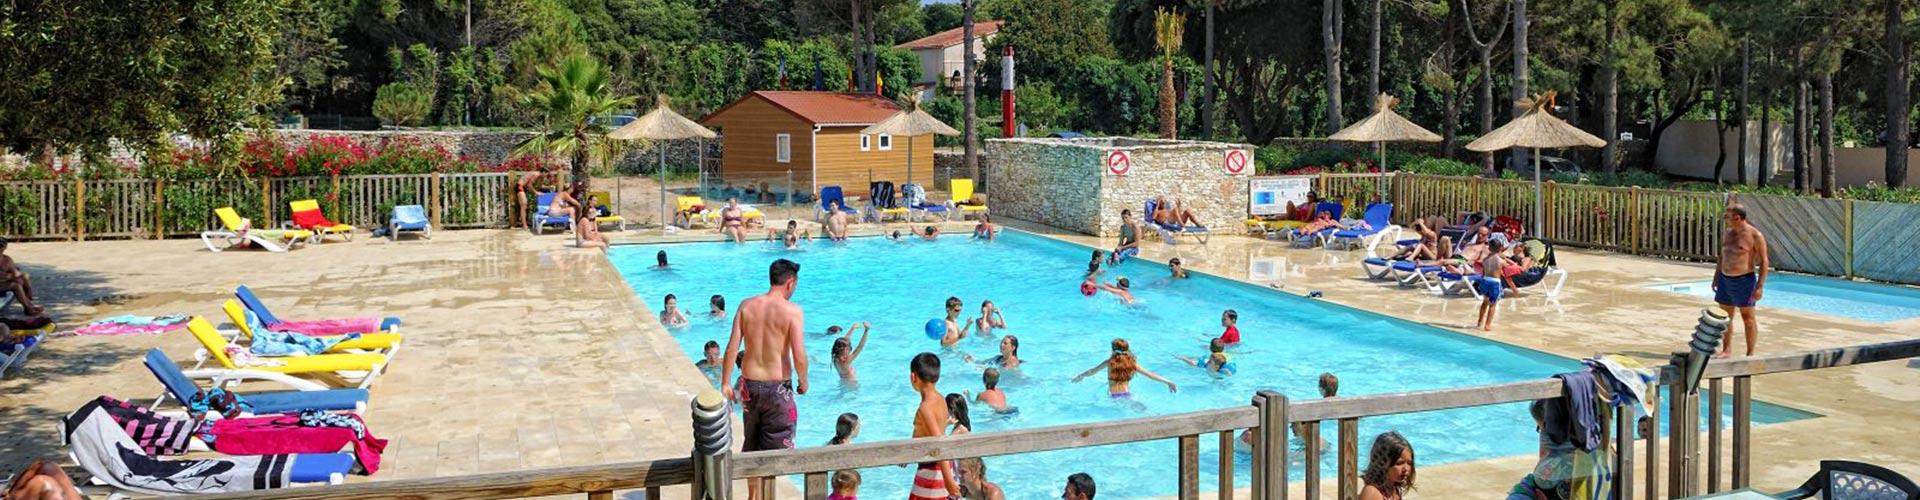 Camping bonifacio 4 etoiles for Camping embrun avec piscine 4 etoiles